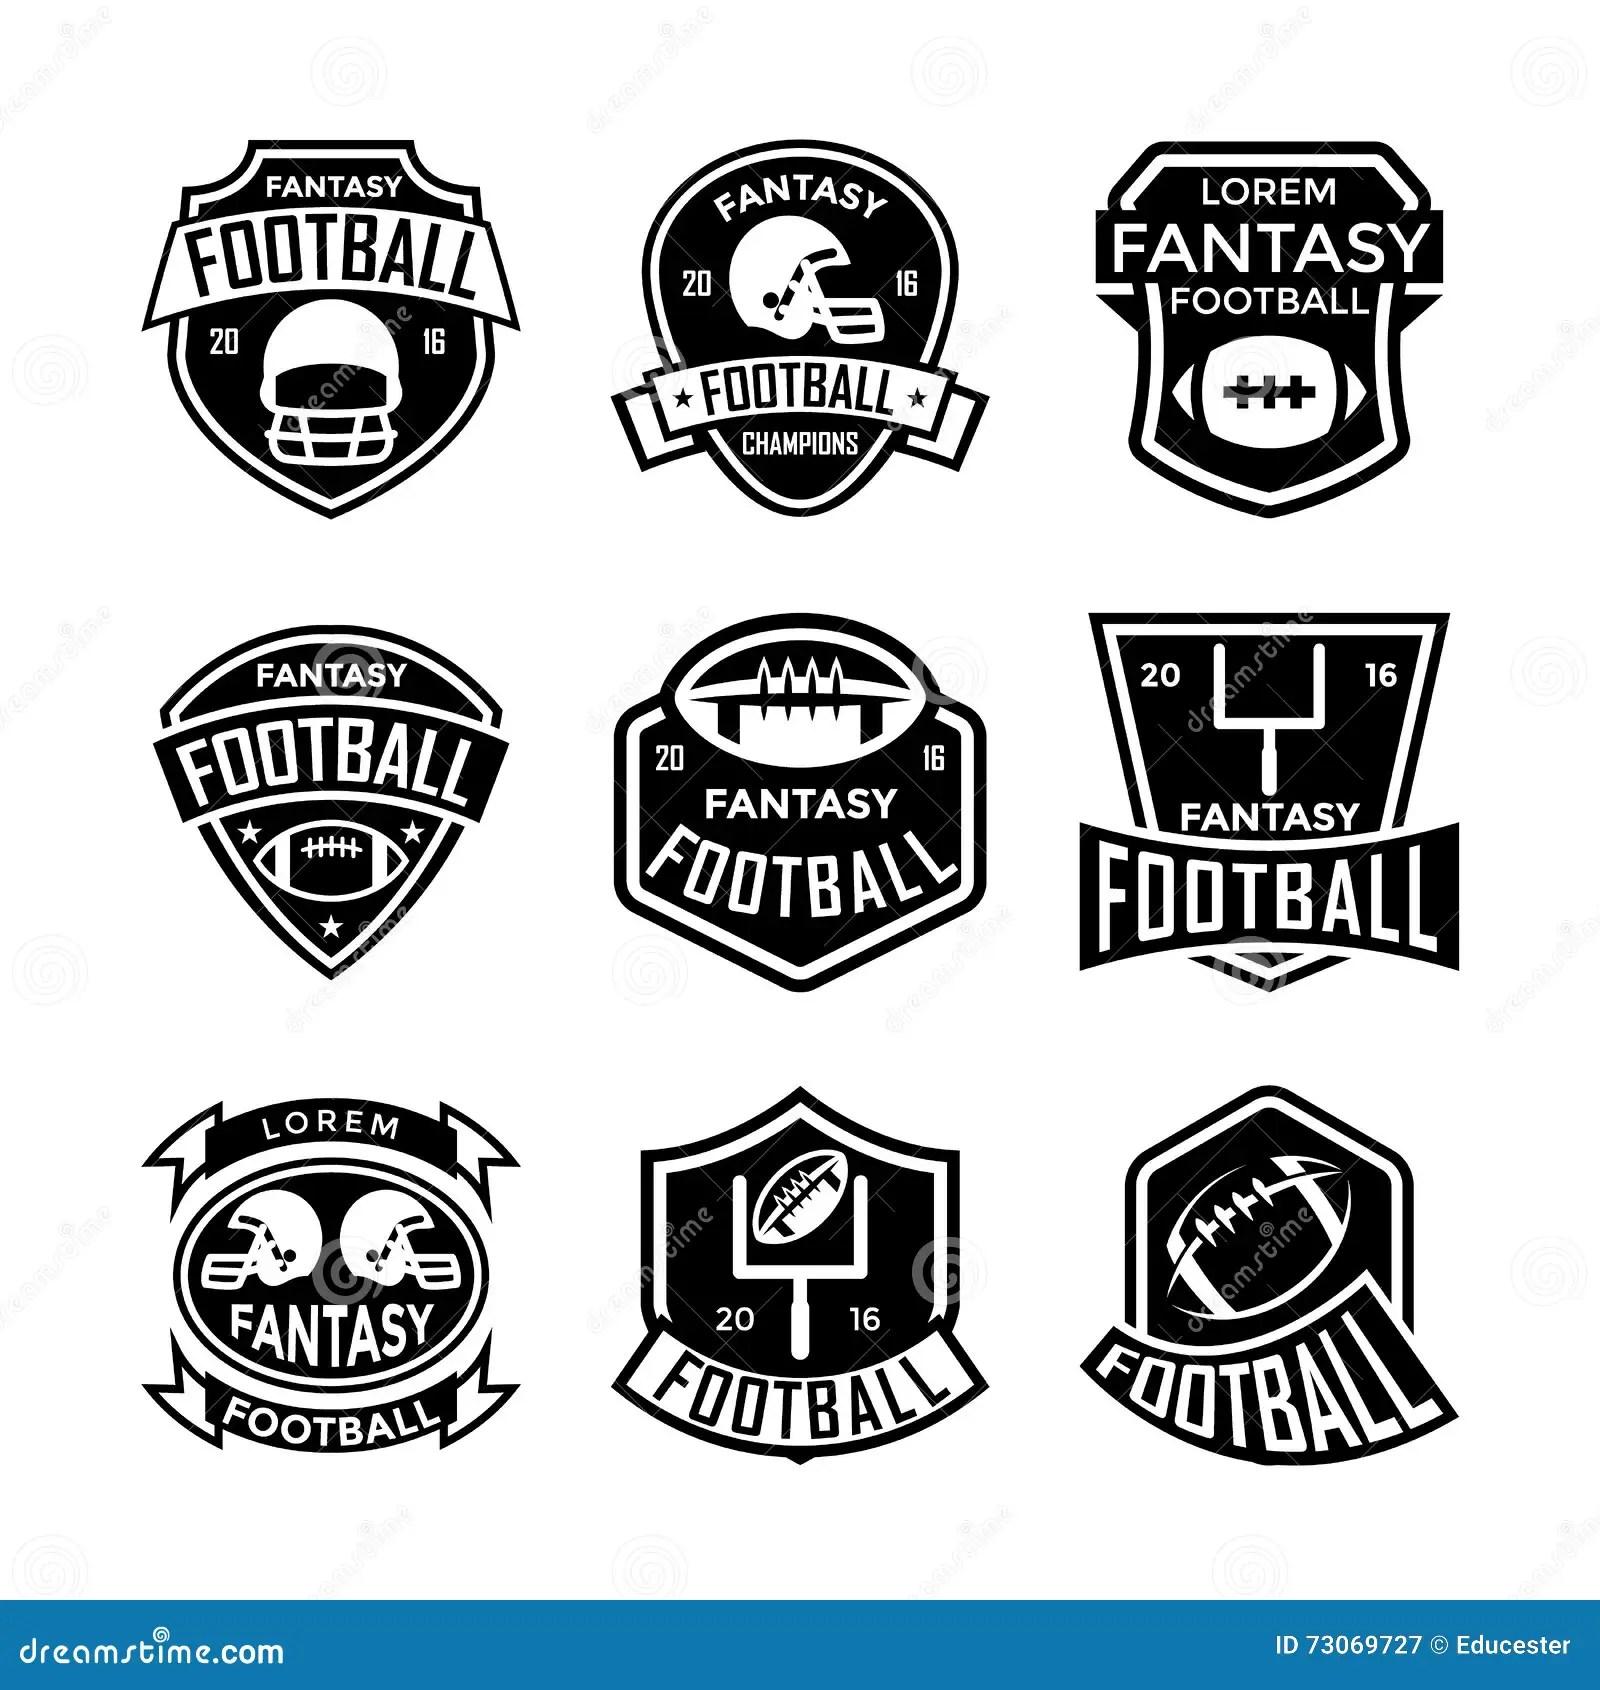 Fantasy Football Vector Icons 13 Stock Illustration